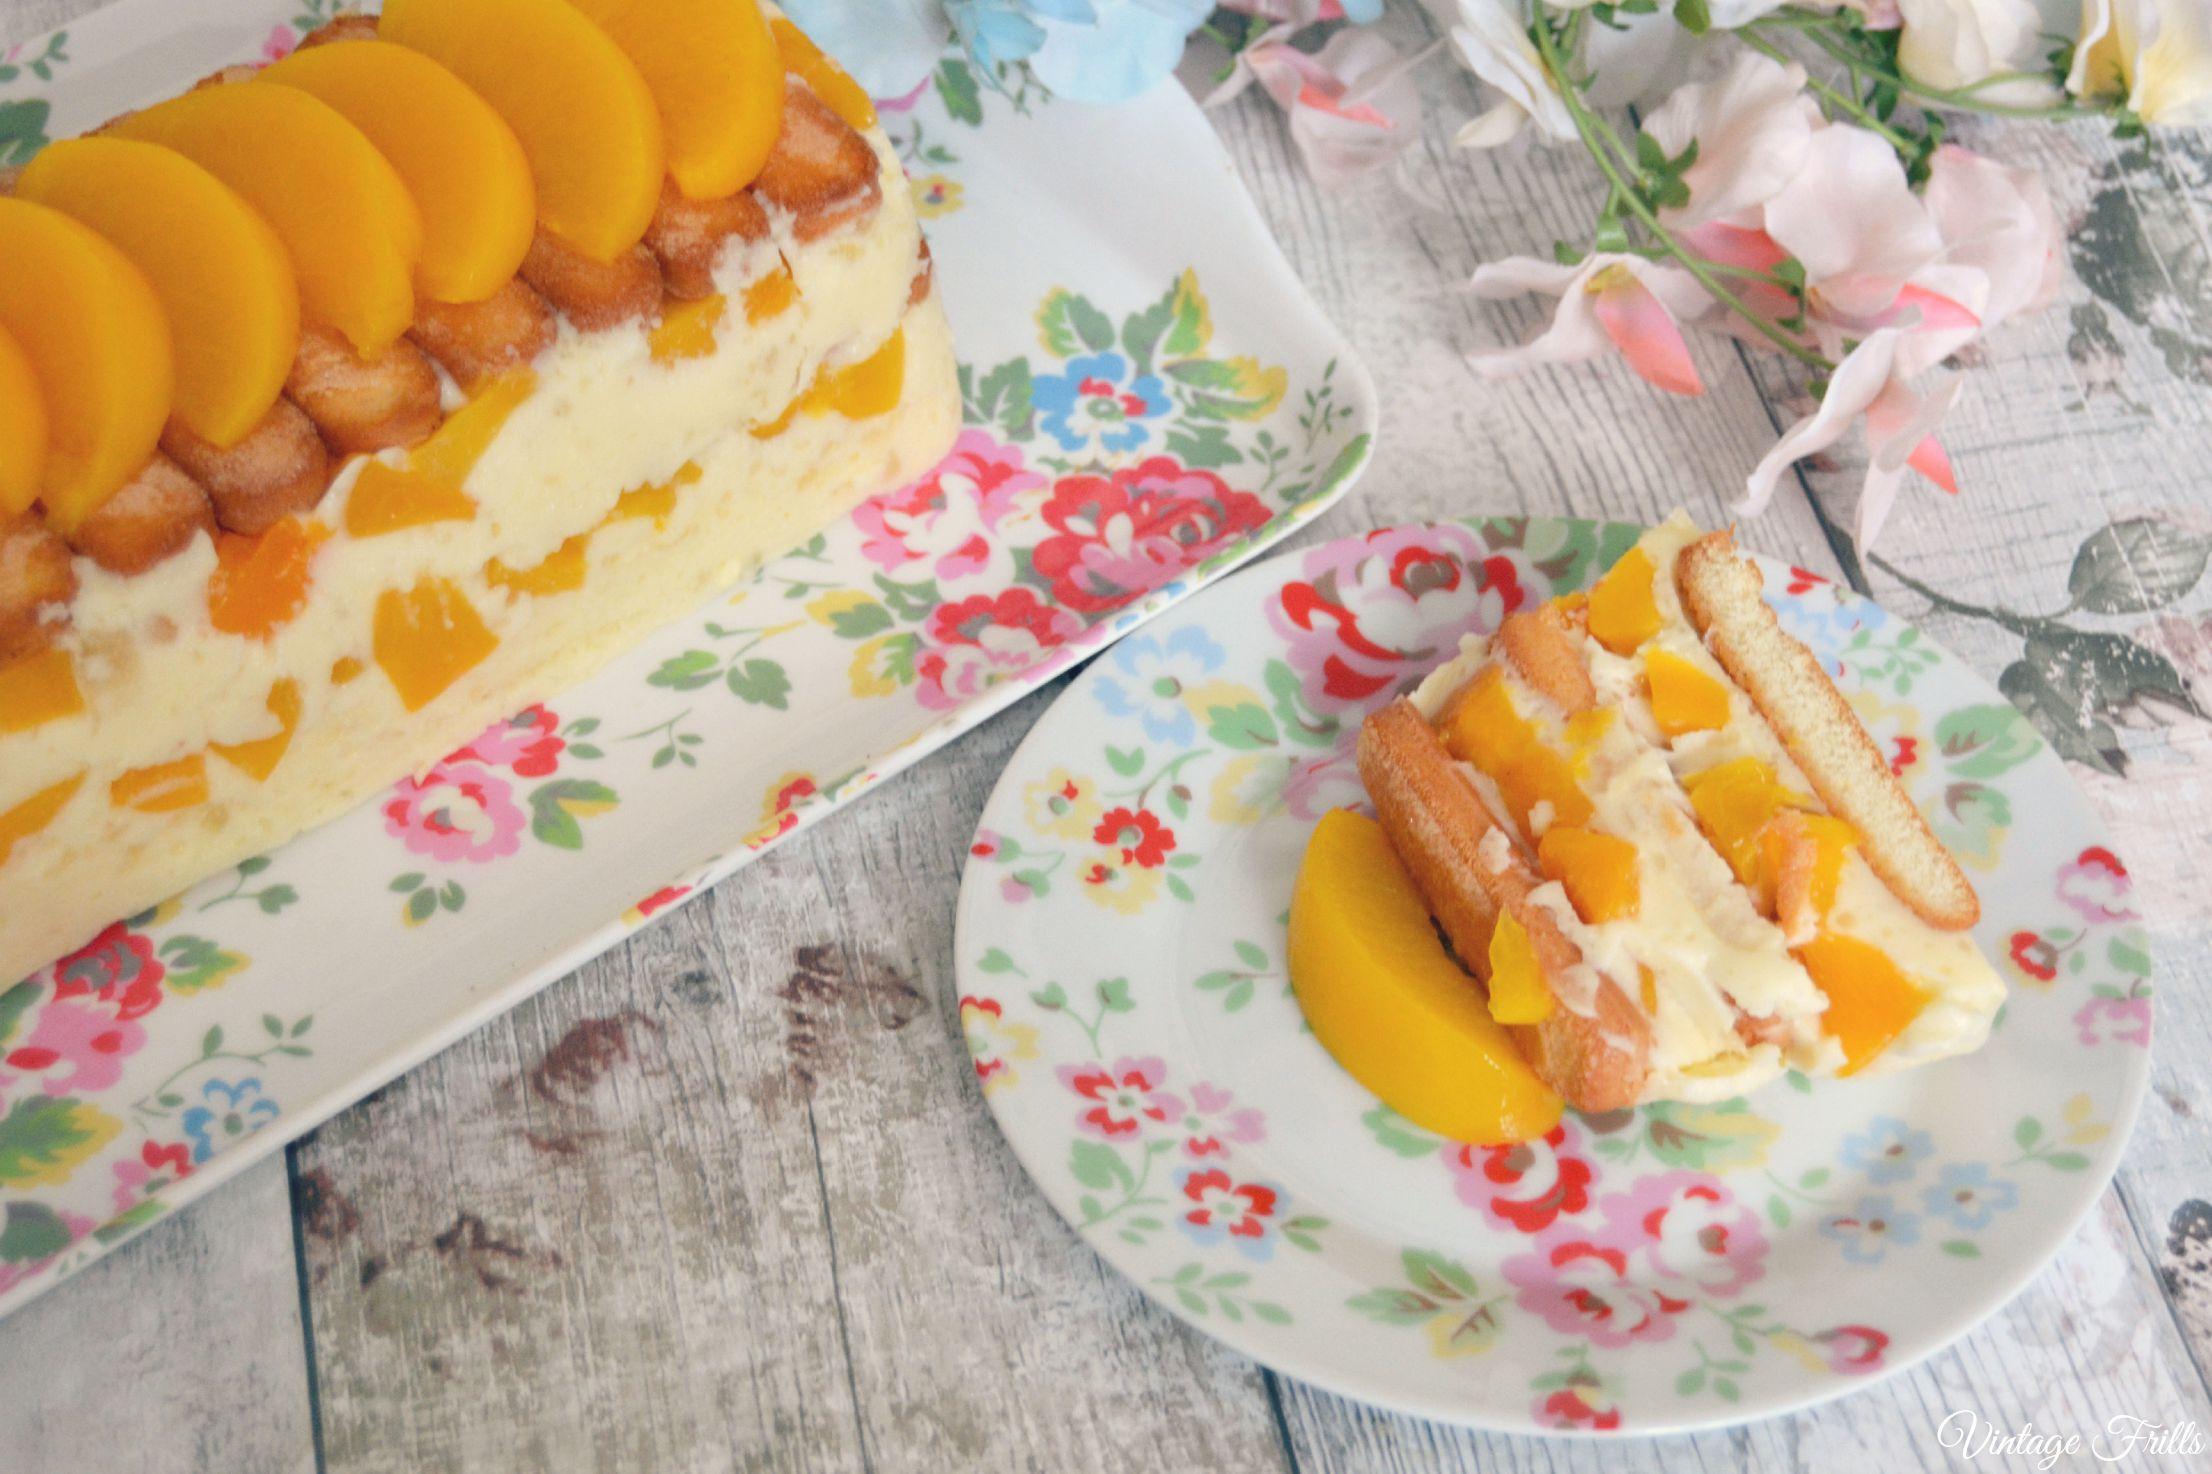 1960s Marshmallow and Peach Refrigerator Dessert Recipe Vintage Frills